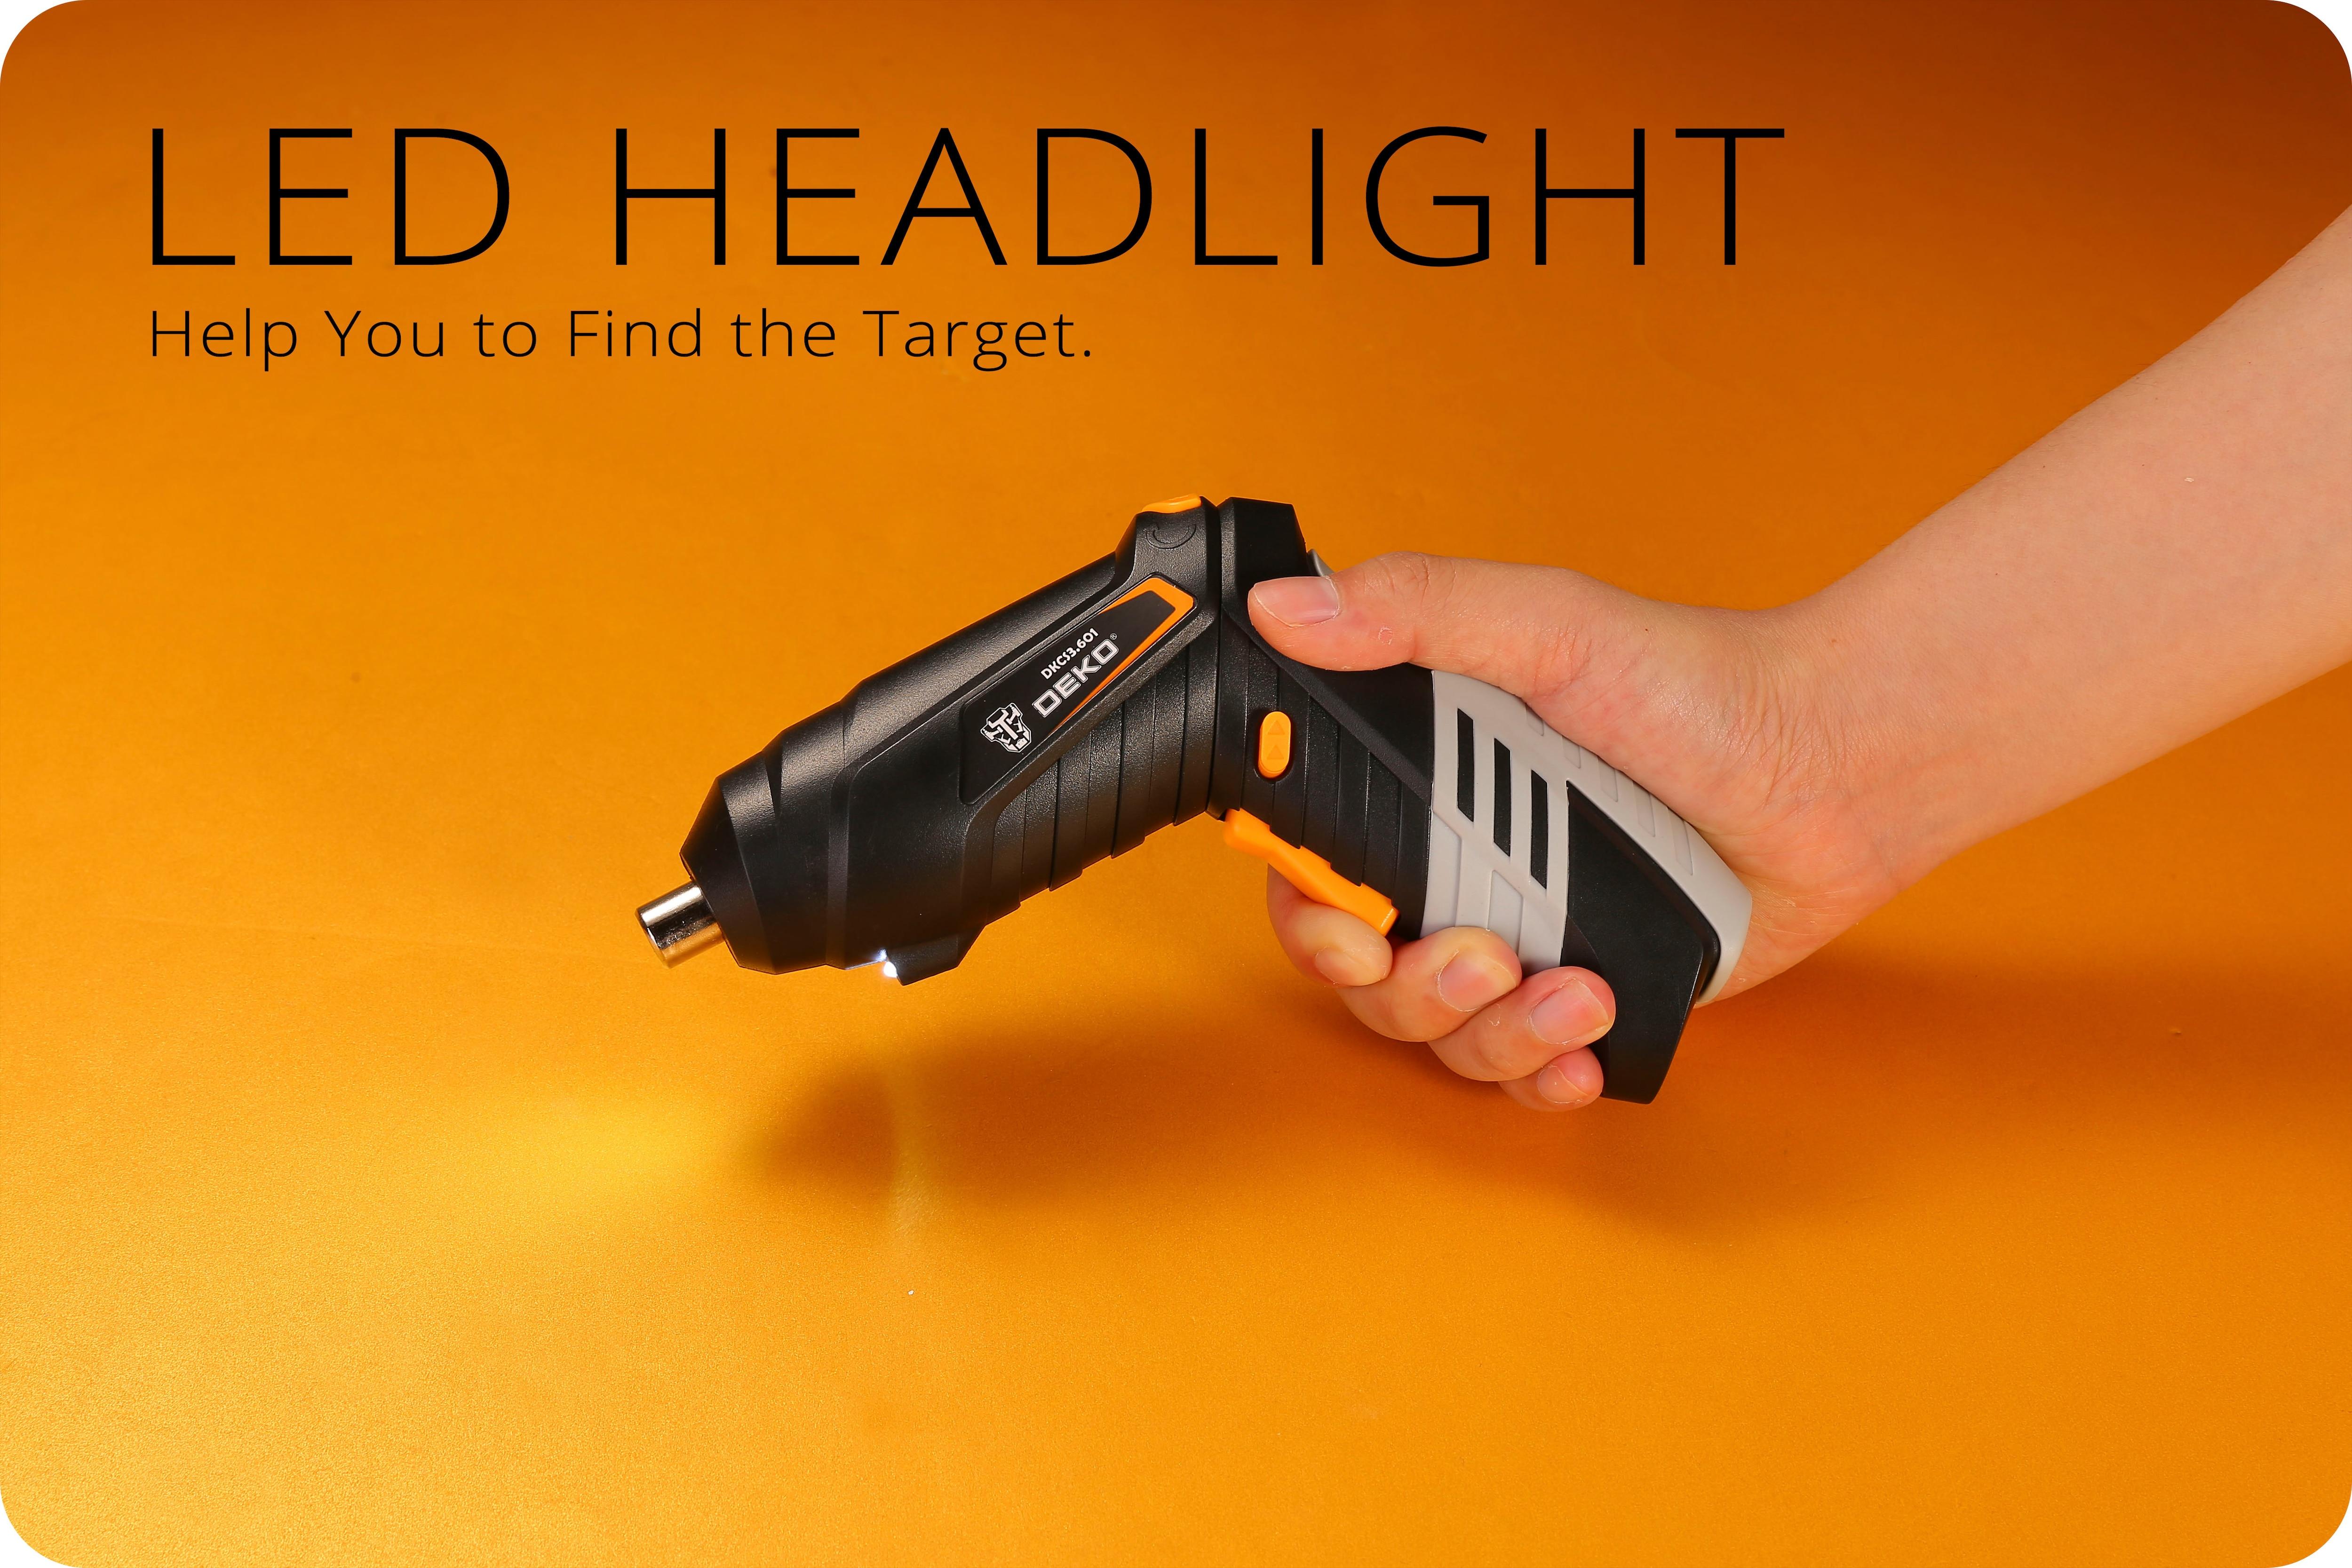 Deko LED Headlight